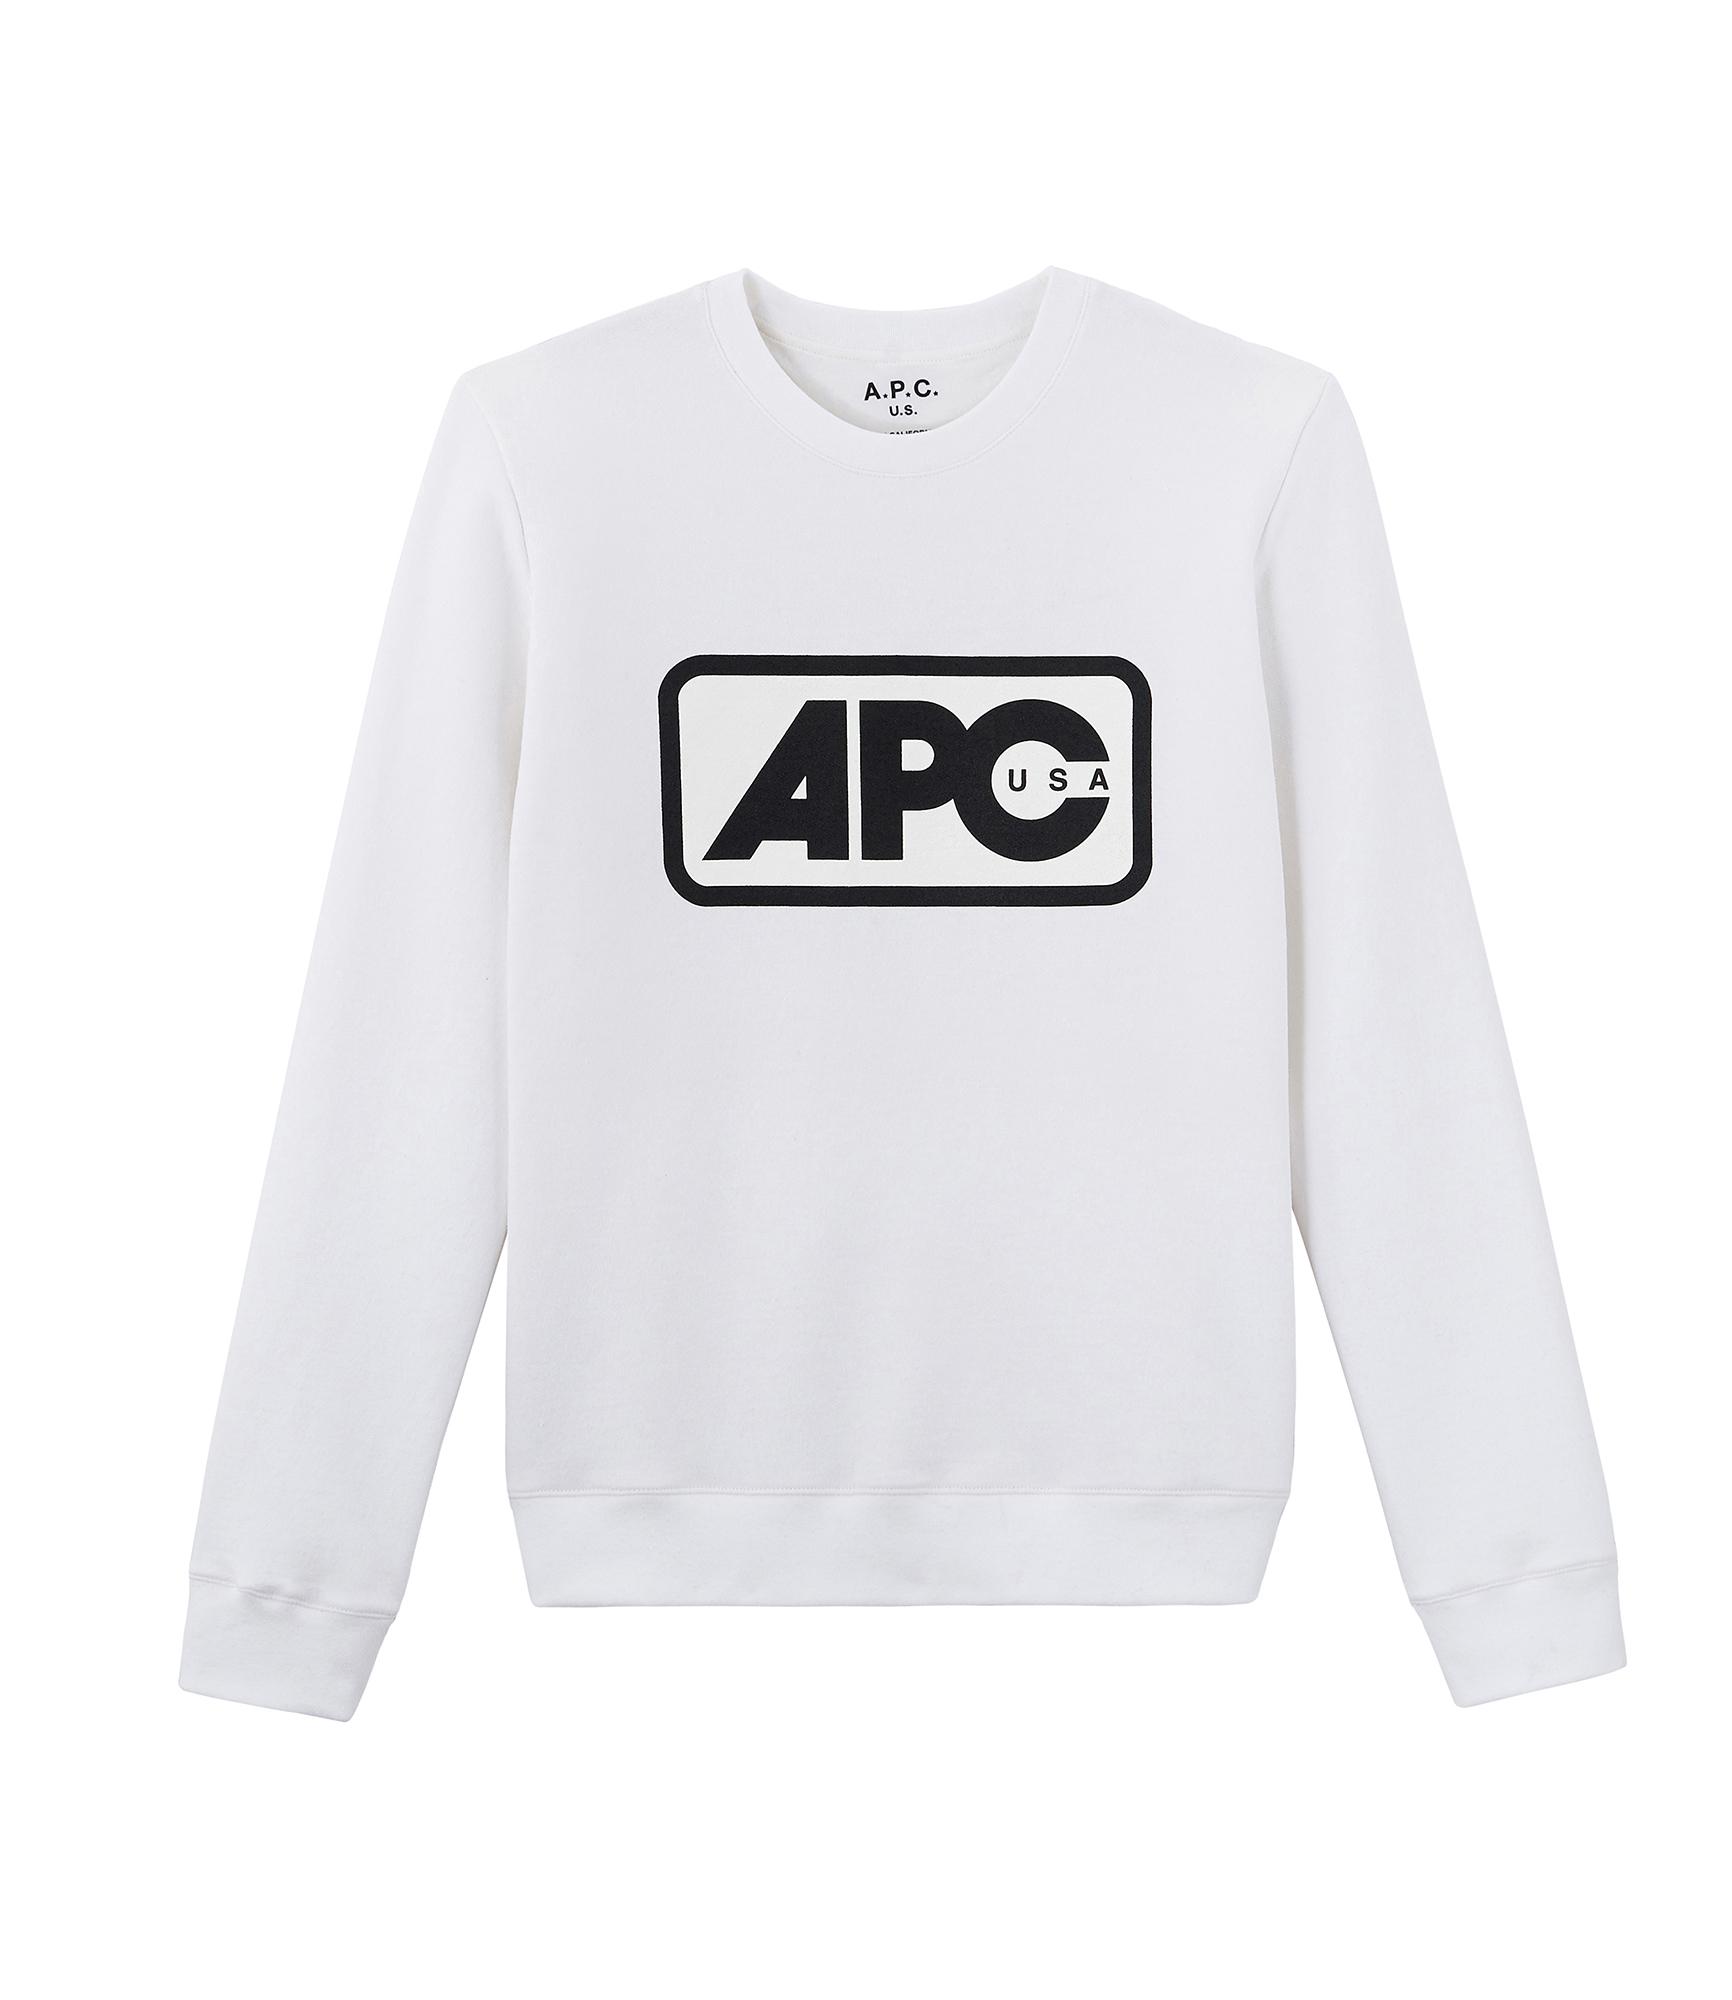 A.P.C. / Vince Sweat Shirt -WHITE